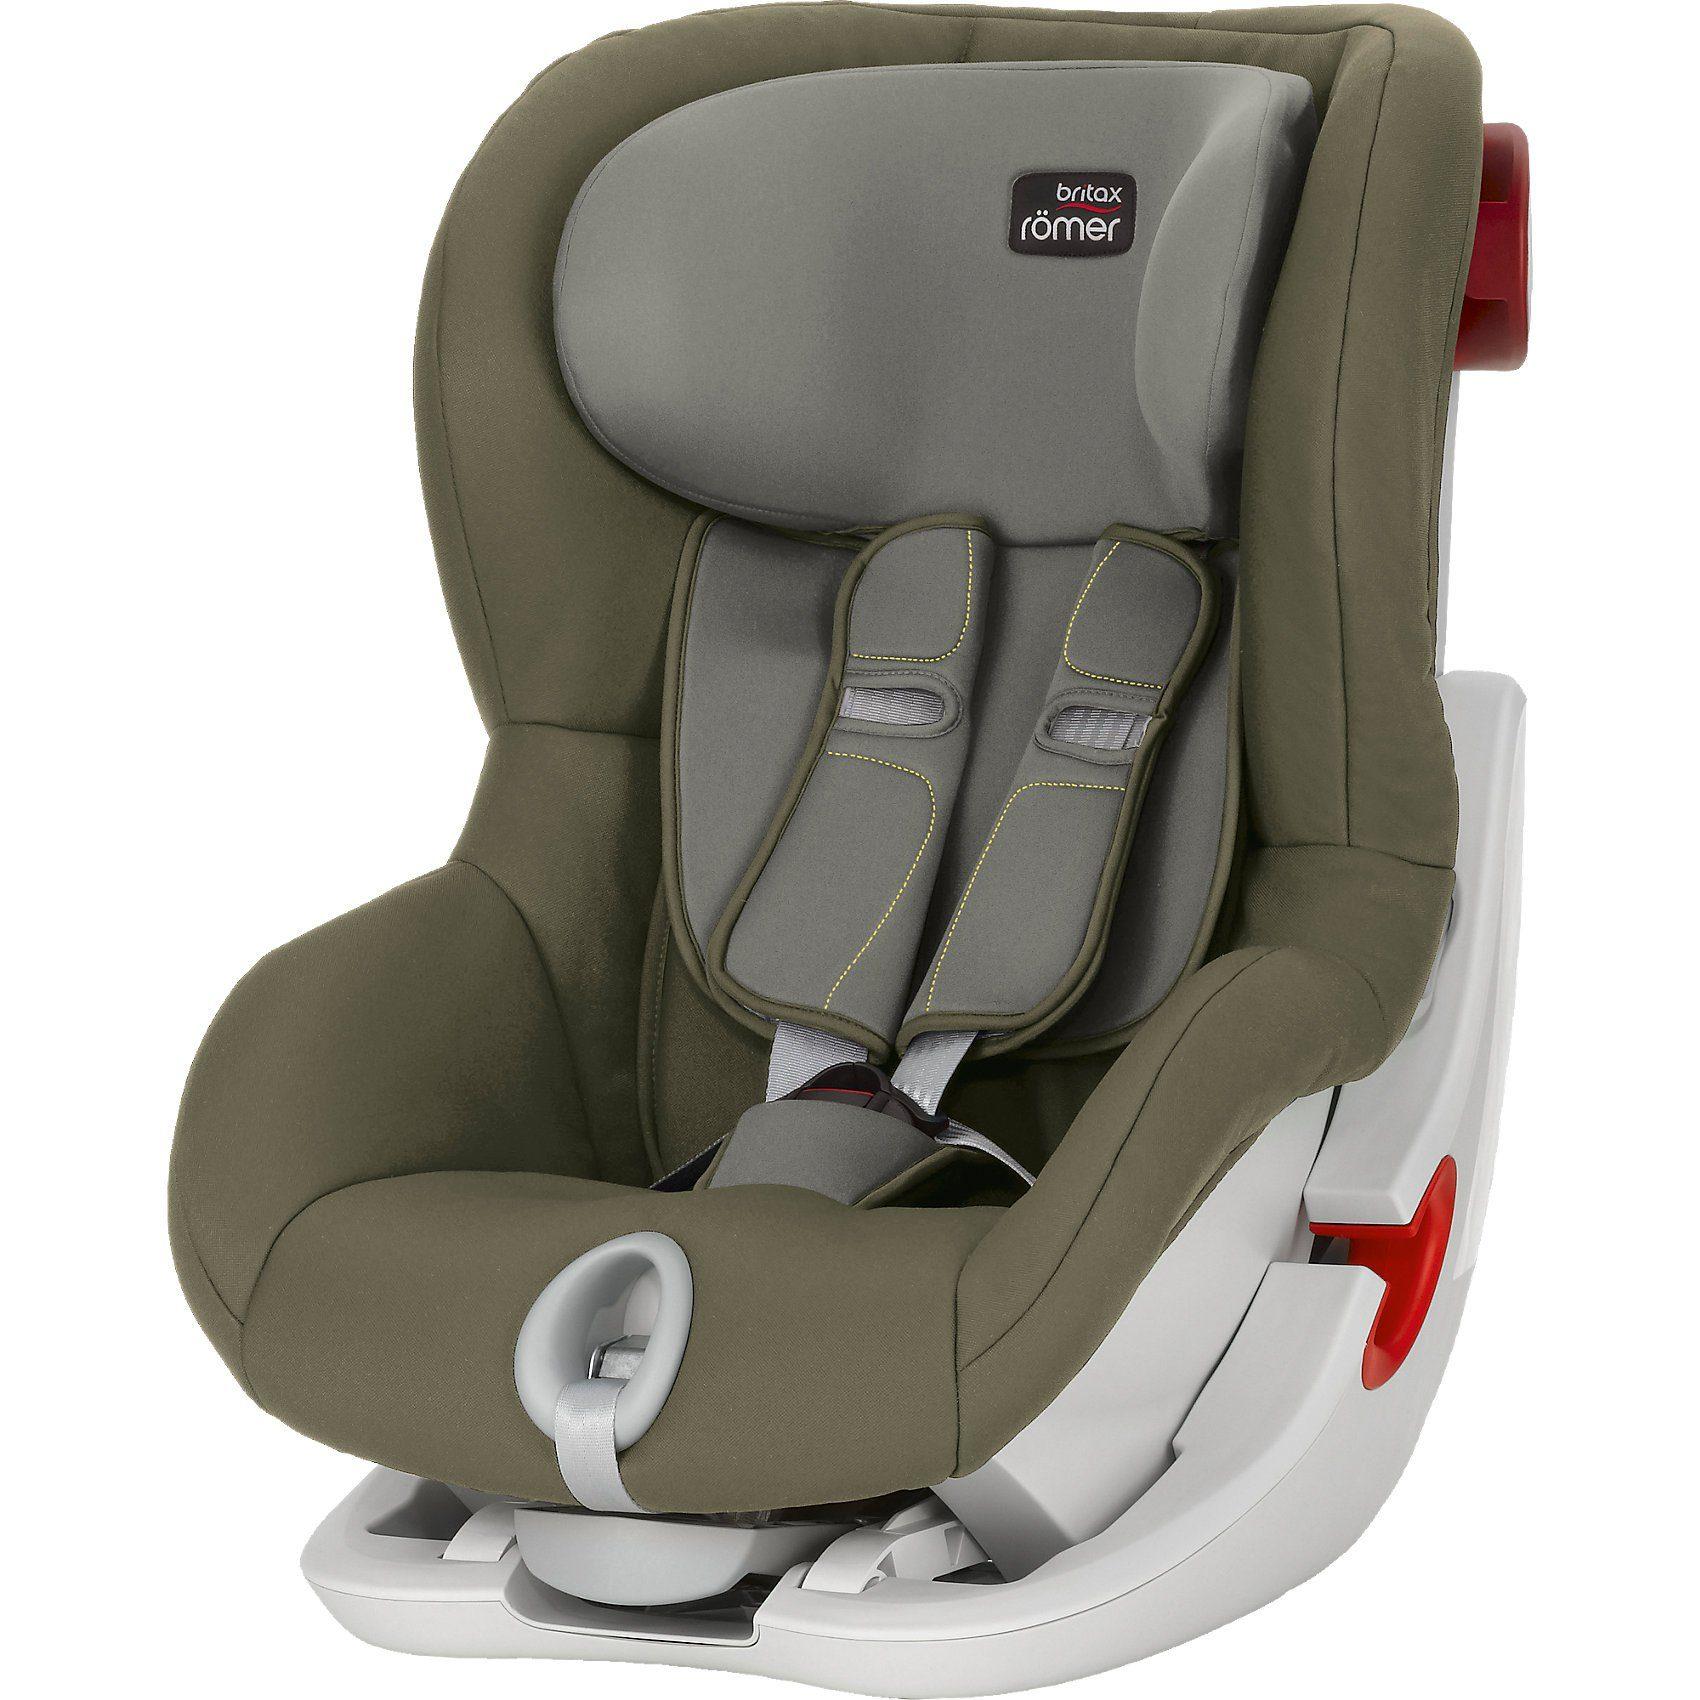 Britax Römer Auto-Kindersitz King II, Olive Green, 2017